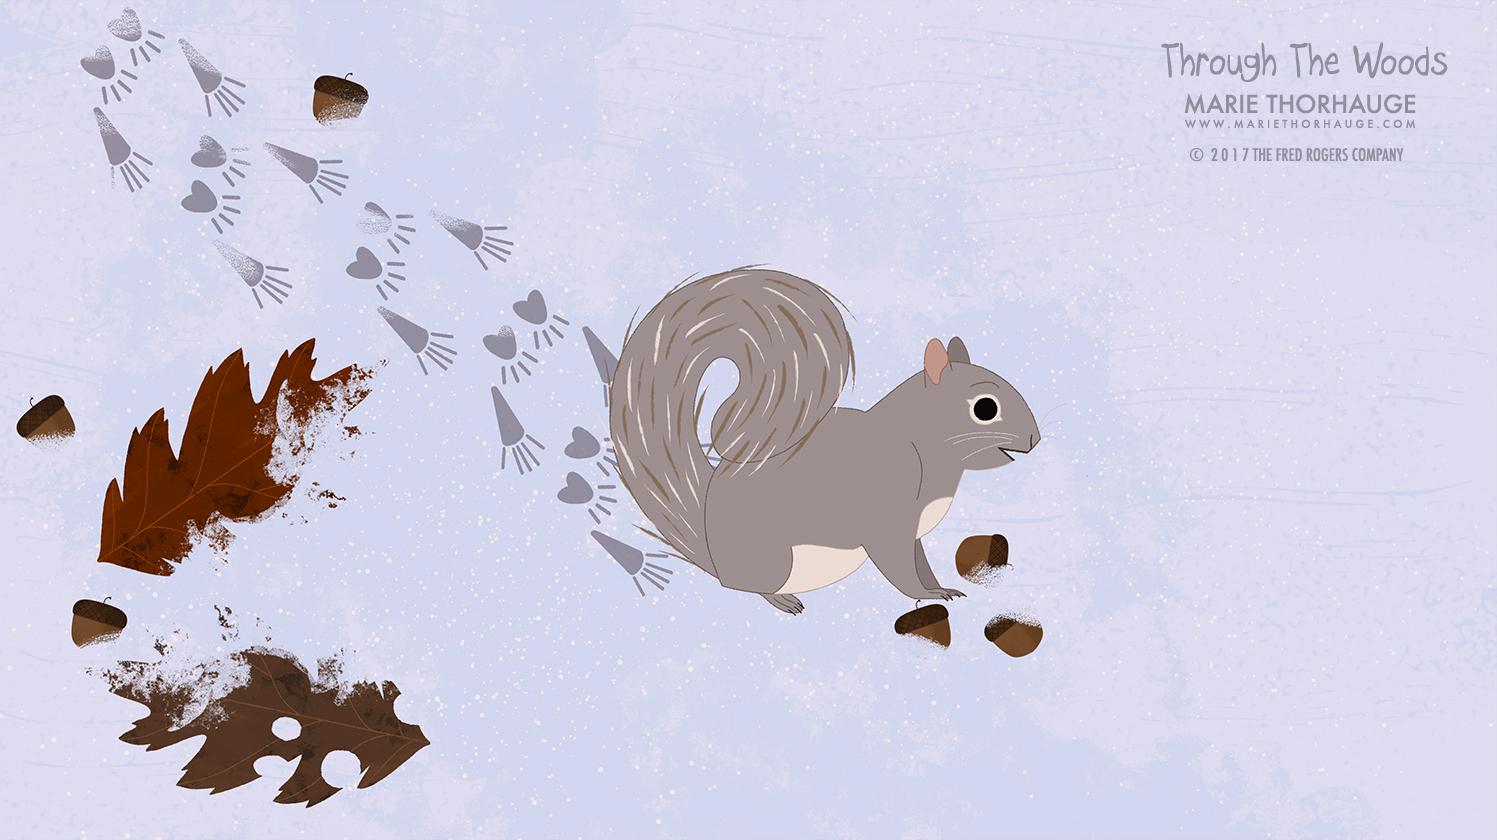 Marie-Thorhauge_Through-The-Woods_Squirrel_winter.jpg